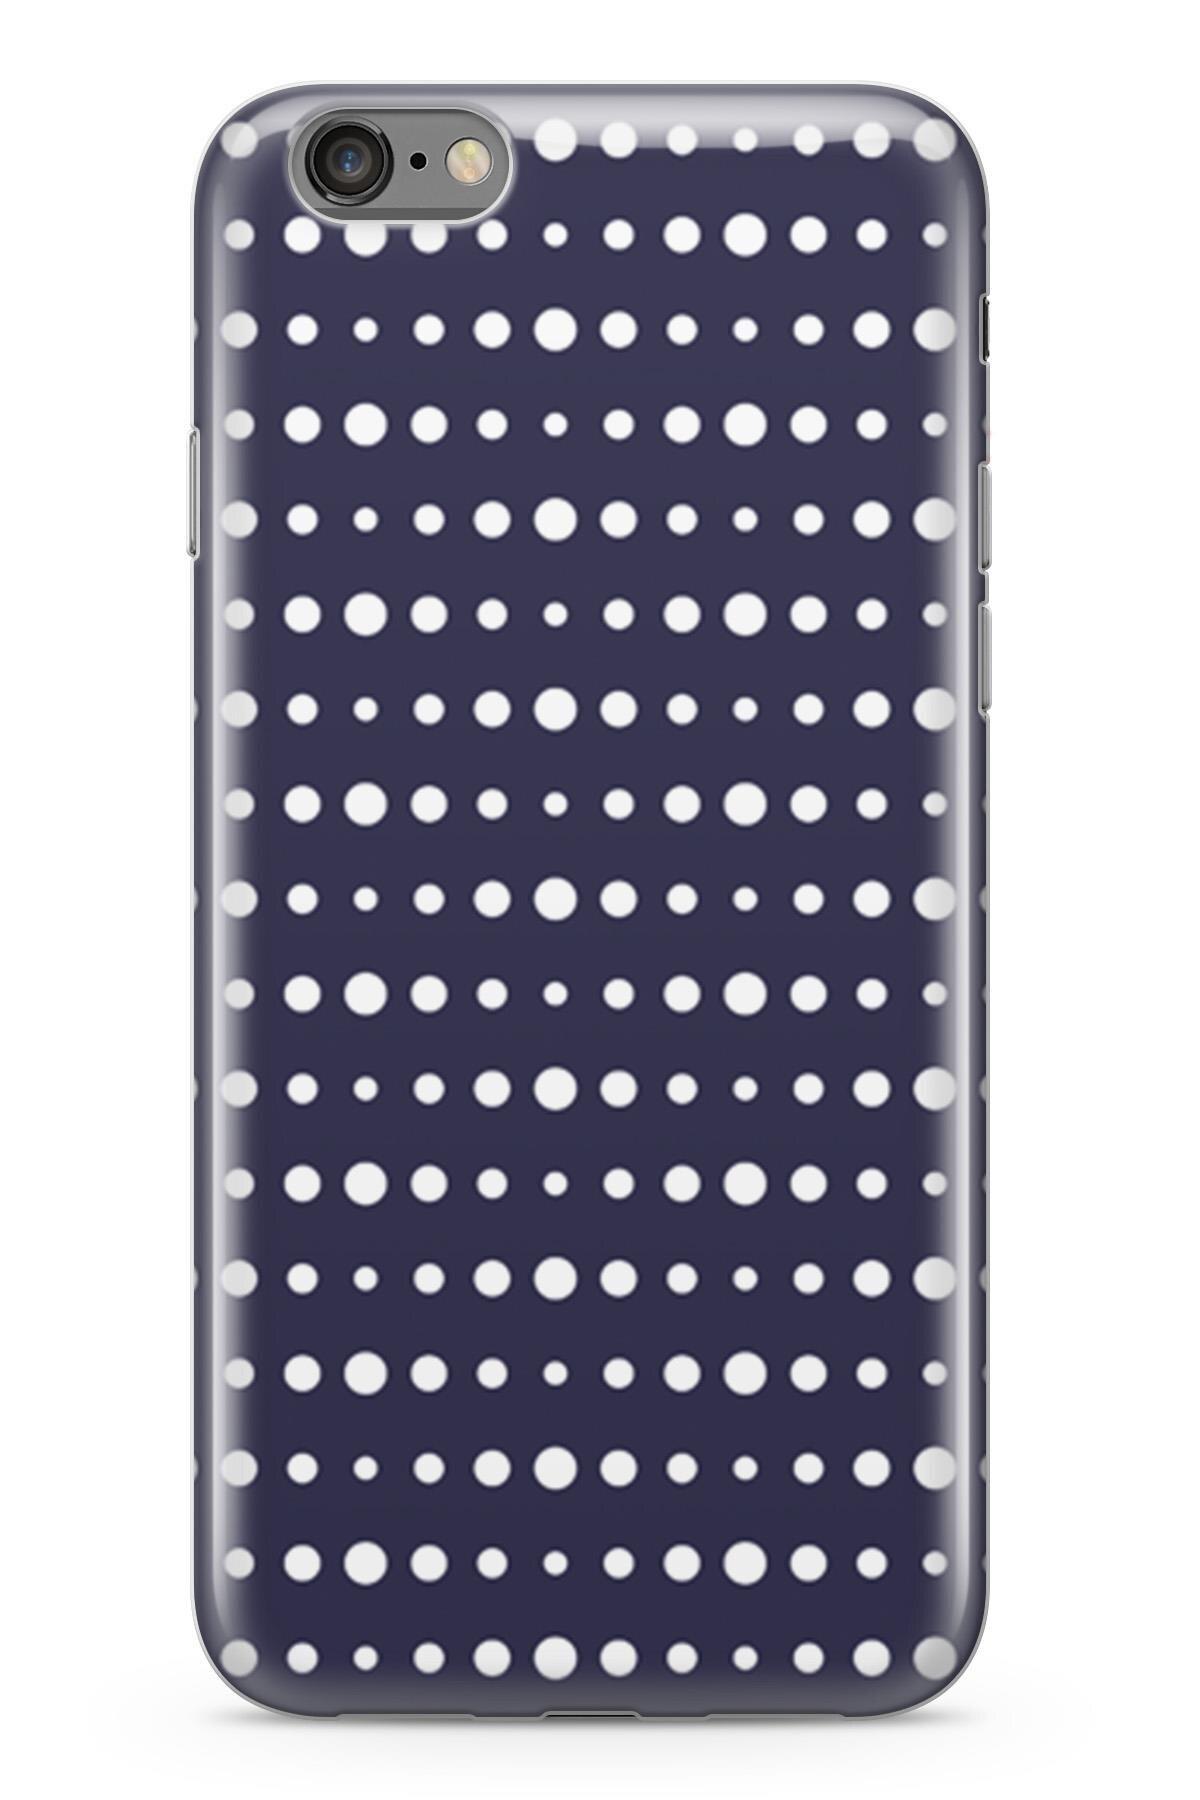 Funda Lopard para Apple iPhone 6 6S, carcasa protectora de silicona, funda trasera azul marino con patrón de lunares